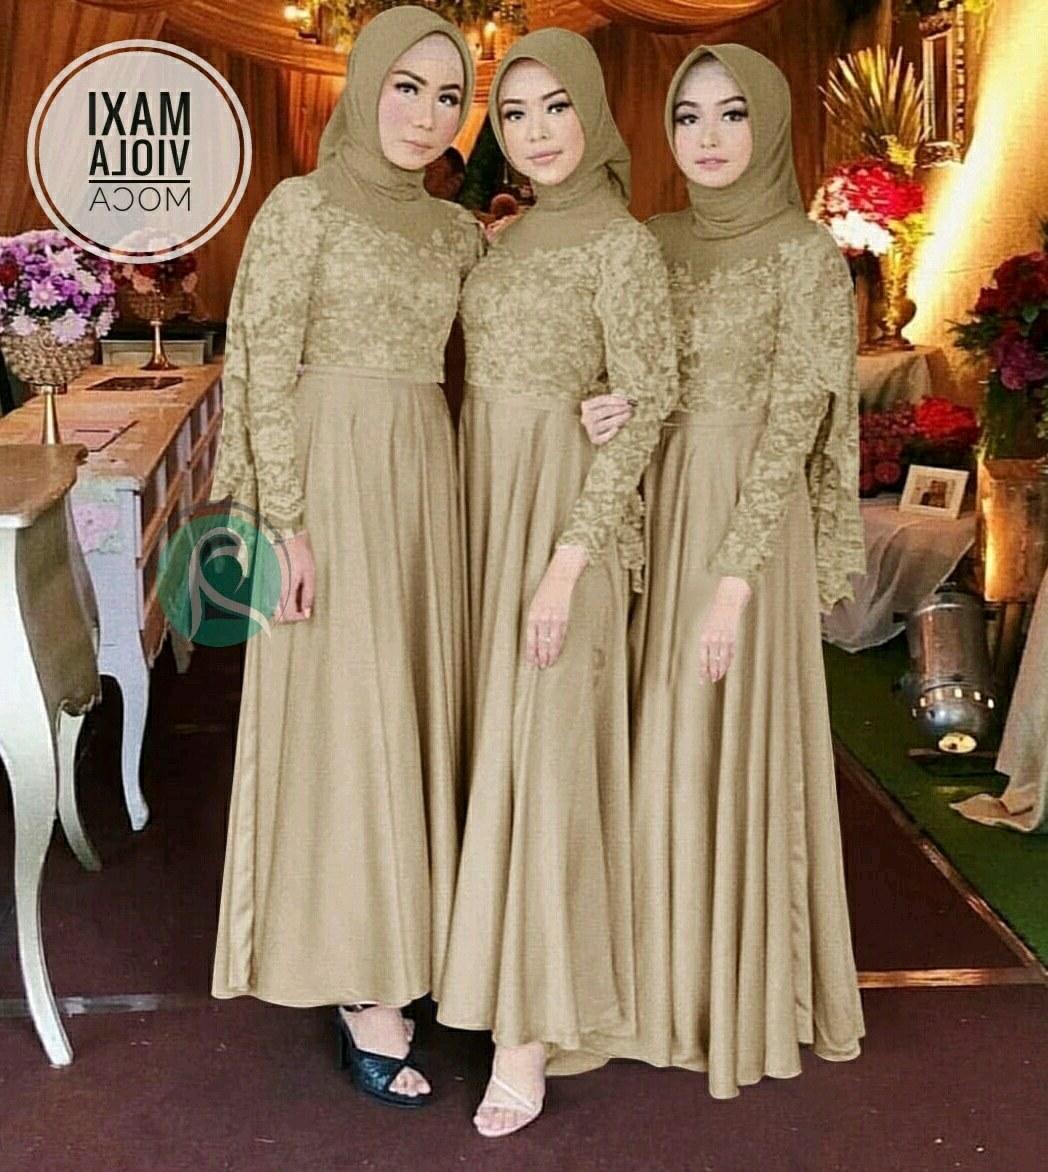 Ide Inspirasi Gaun Bridesmaid Hijab Qwdq Bridesmaid Hijab Dress – Fashion Dresses